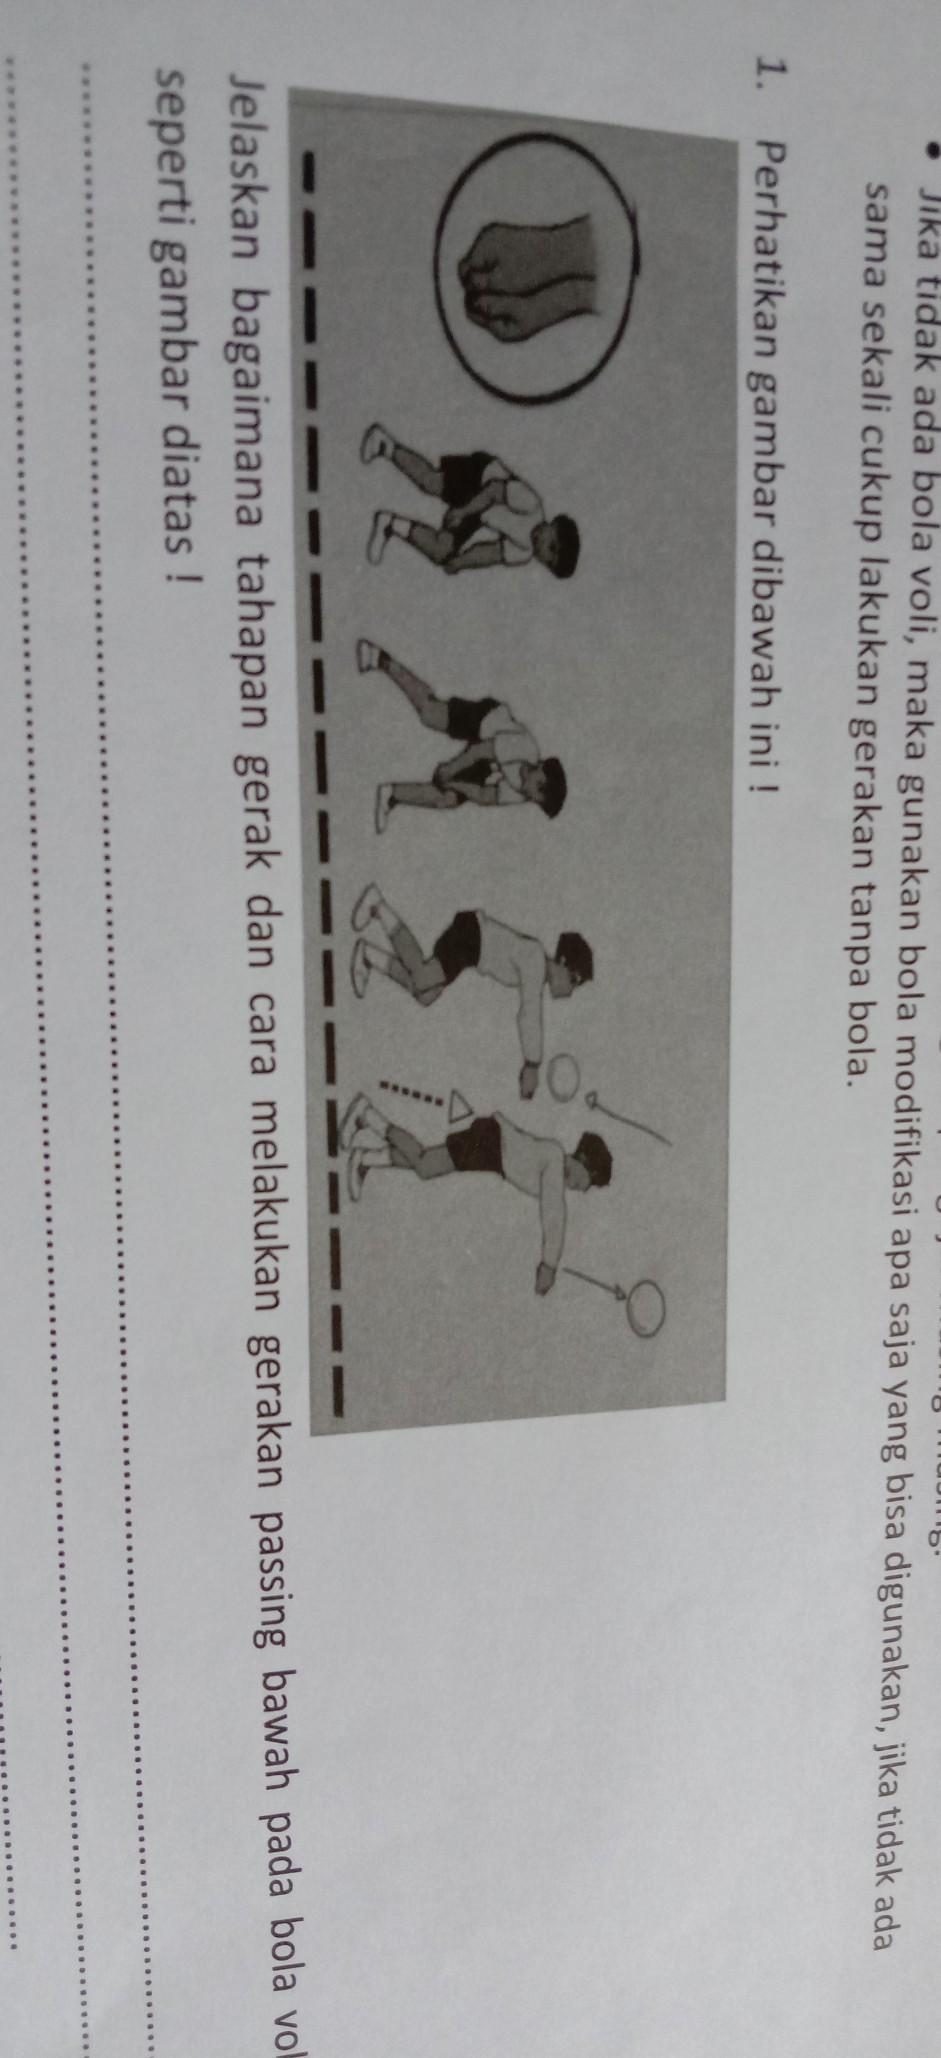 Jelaskan Bagaimana Tahapan Gerak Dan Cara Melakukan Gerakan Passing Bawah Pada Bola Voli Seperti Brainly Co Id